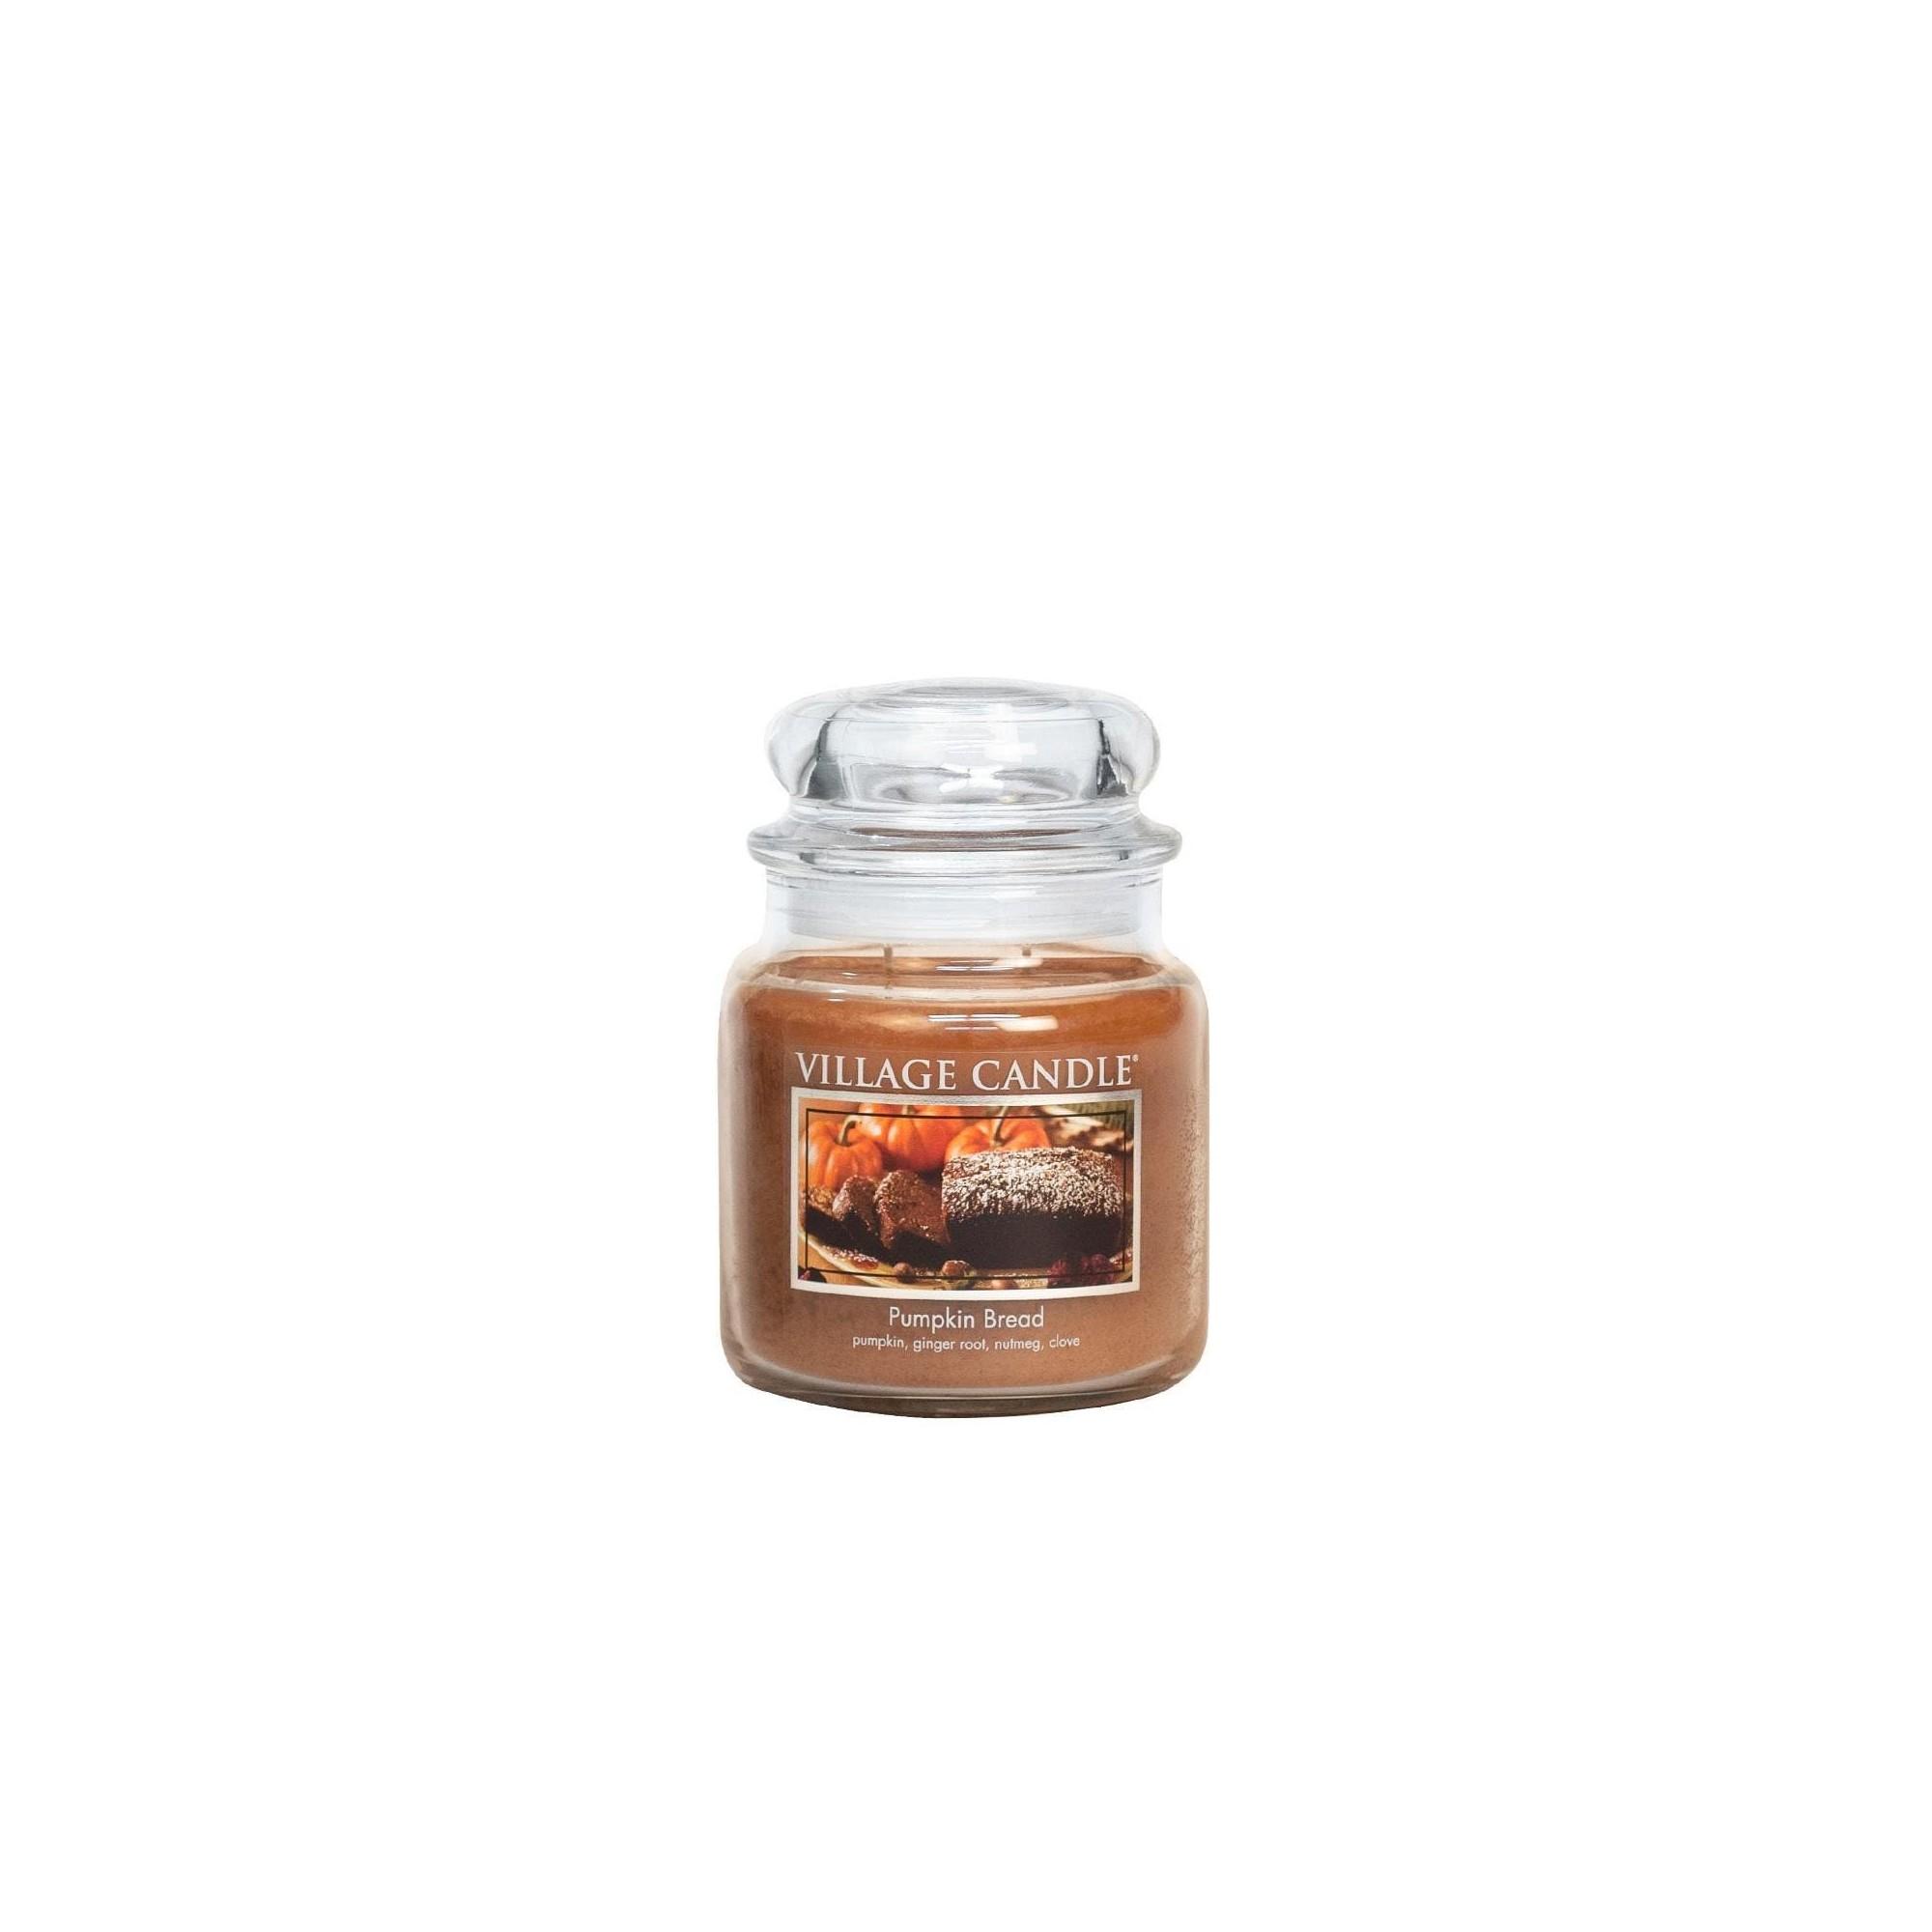 Village Candle Pumpkin Bread Medium Jar Glass